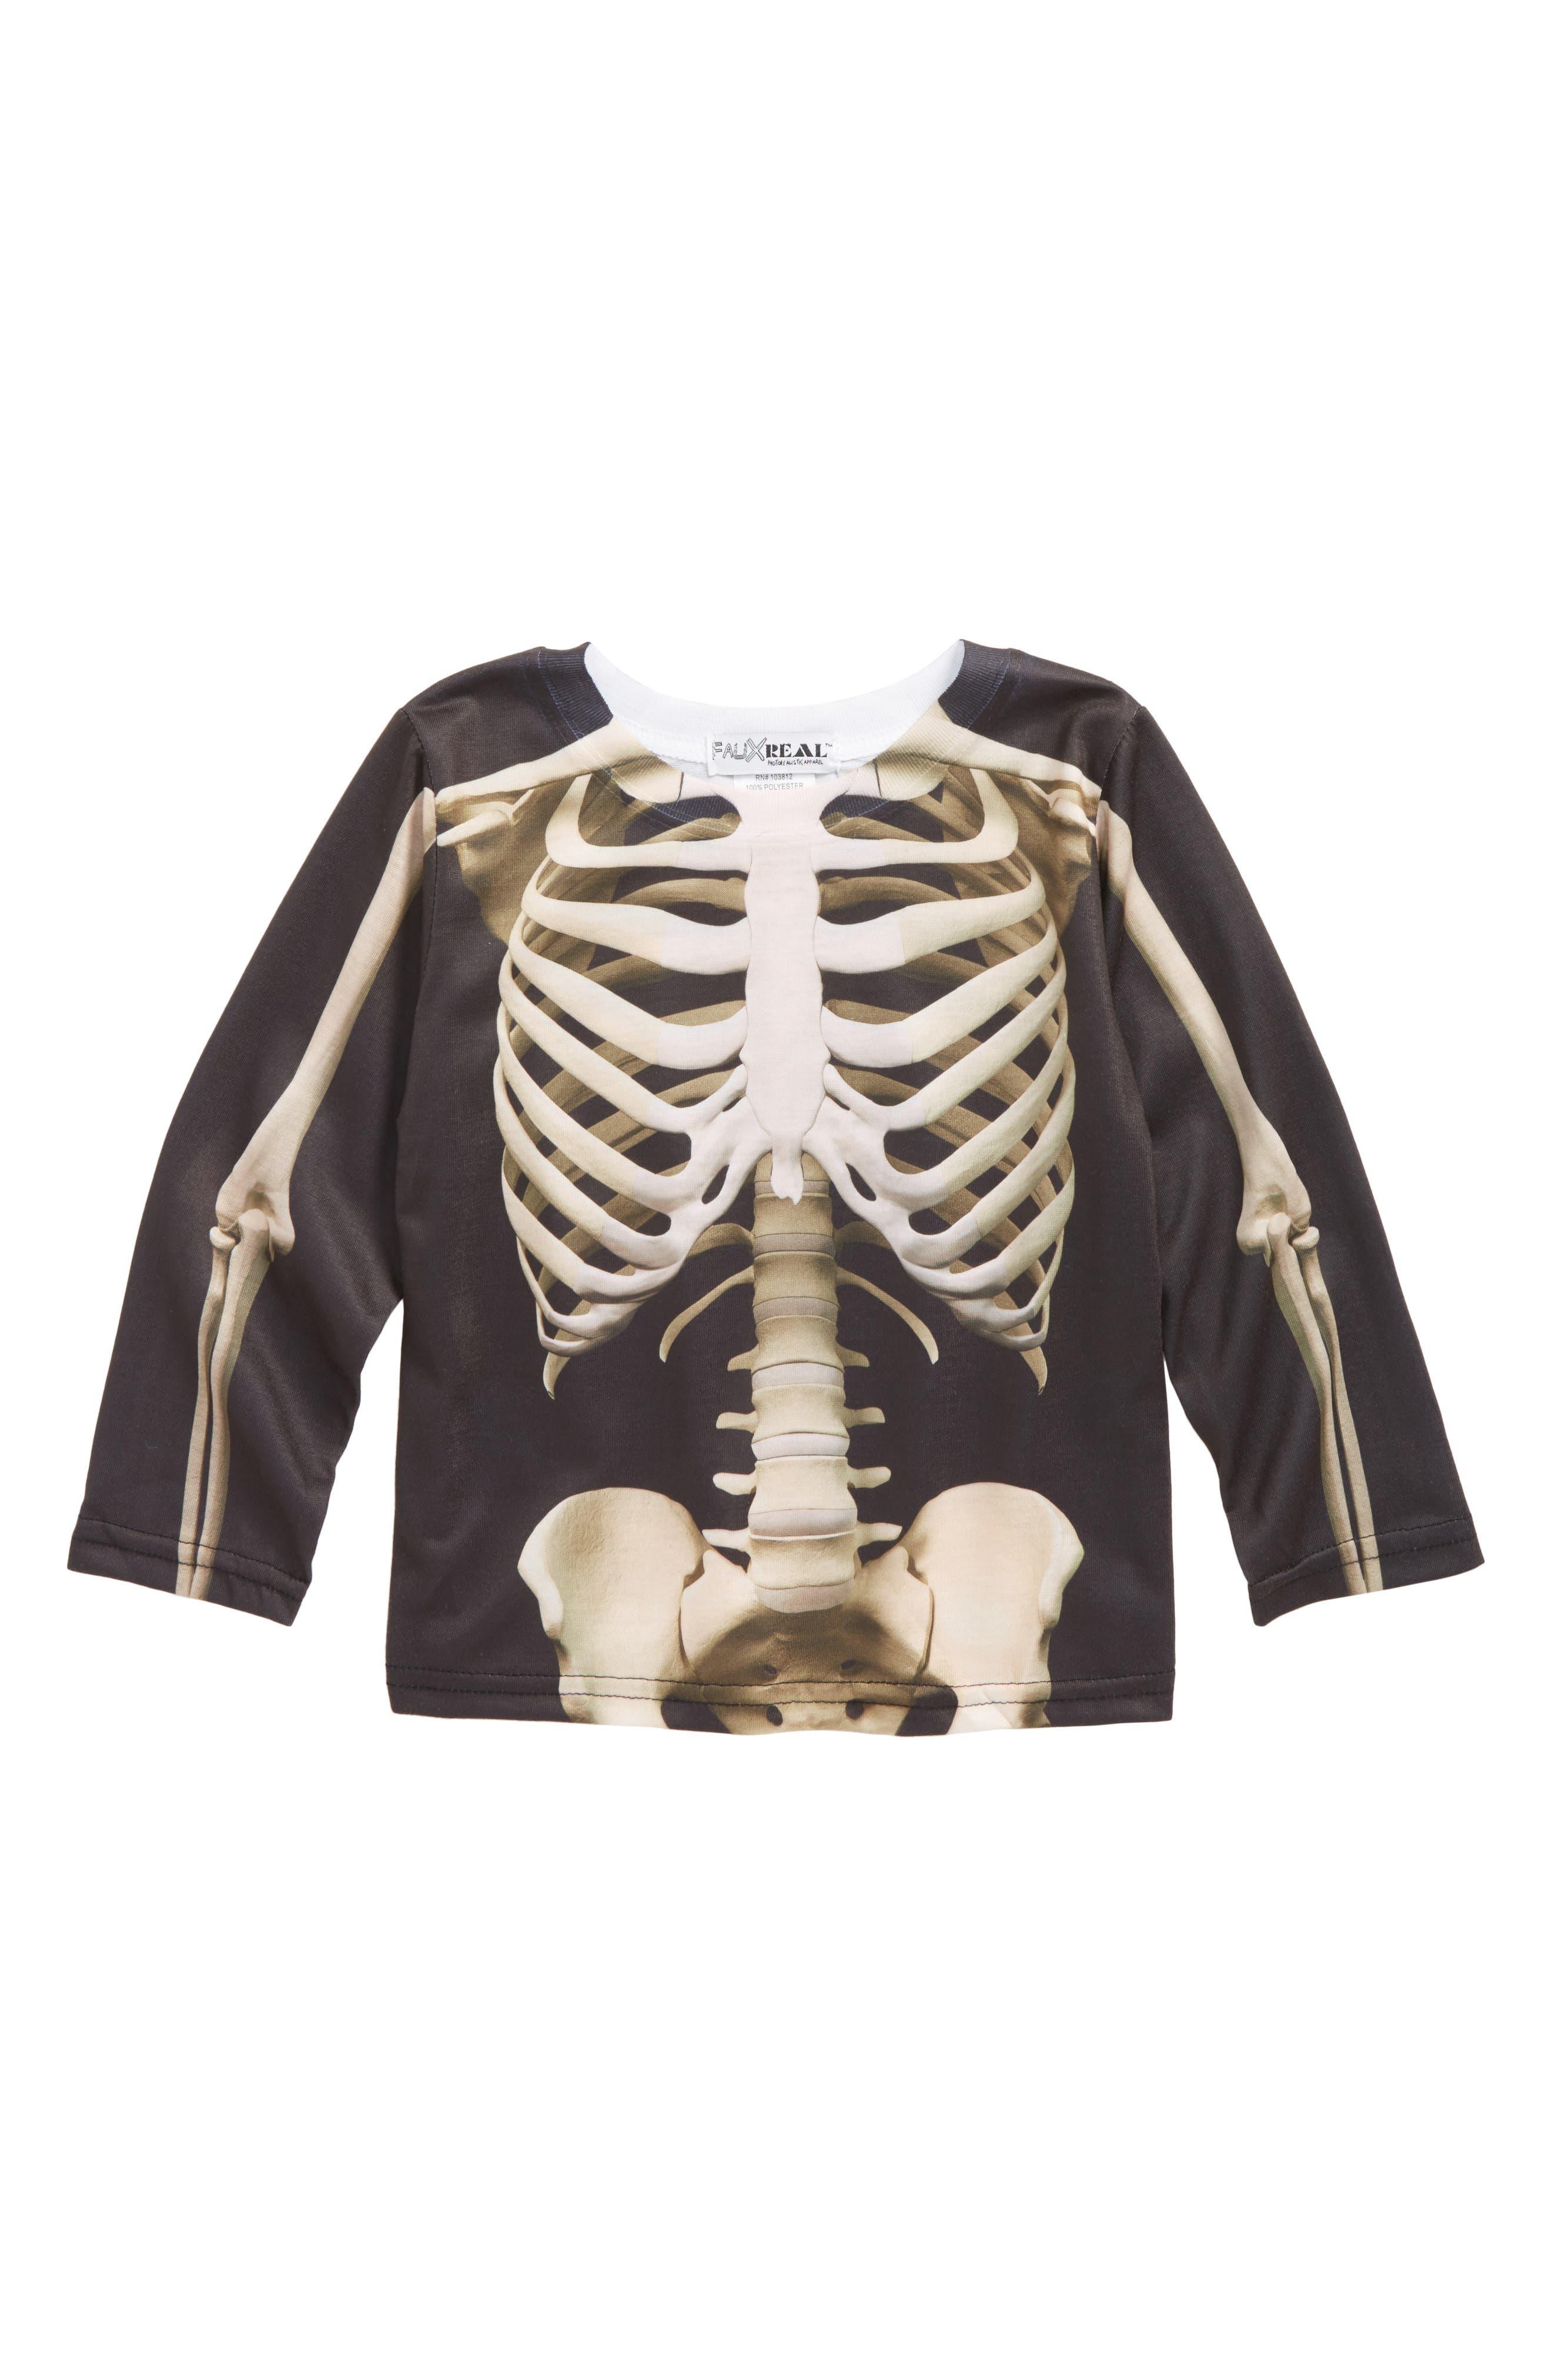 Alternate Image 1 Selected - Faux Real Skeleton Screenprint T-Shirt (Toddler Boys)